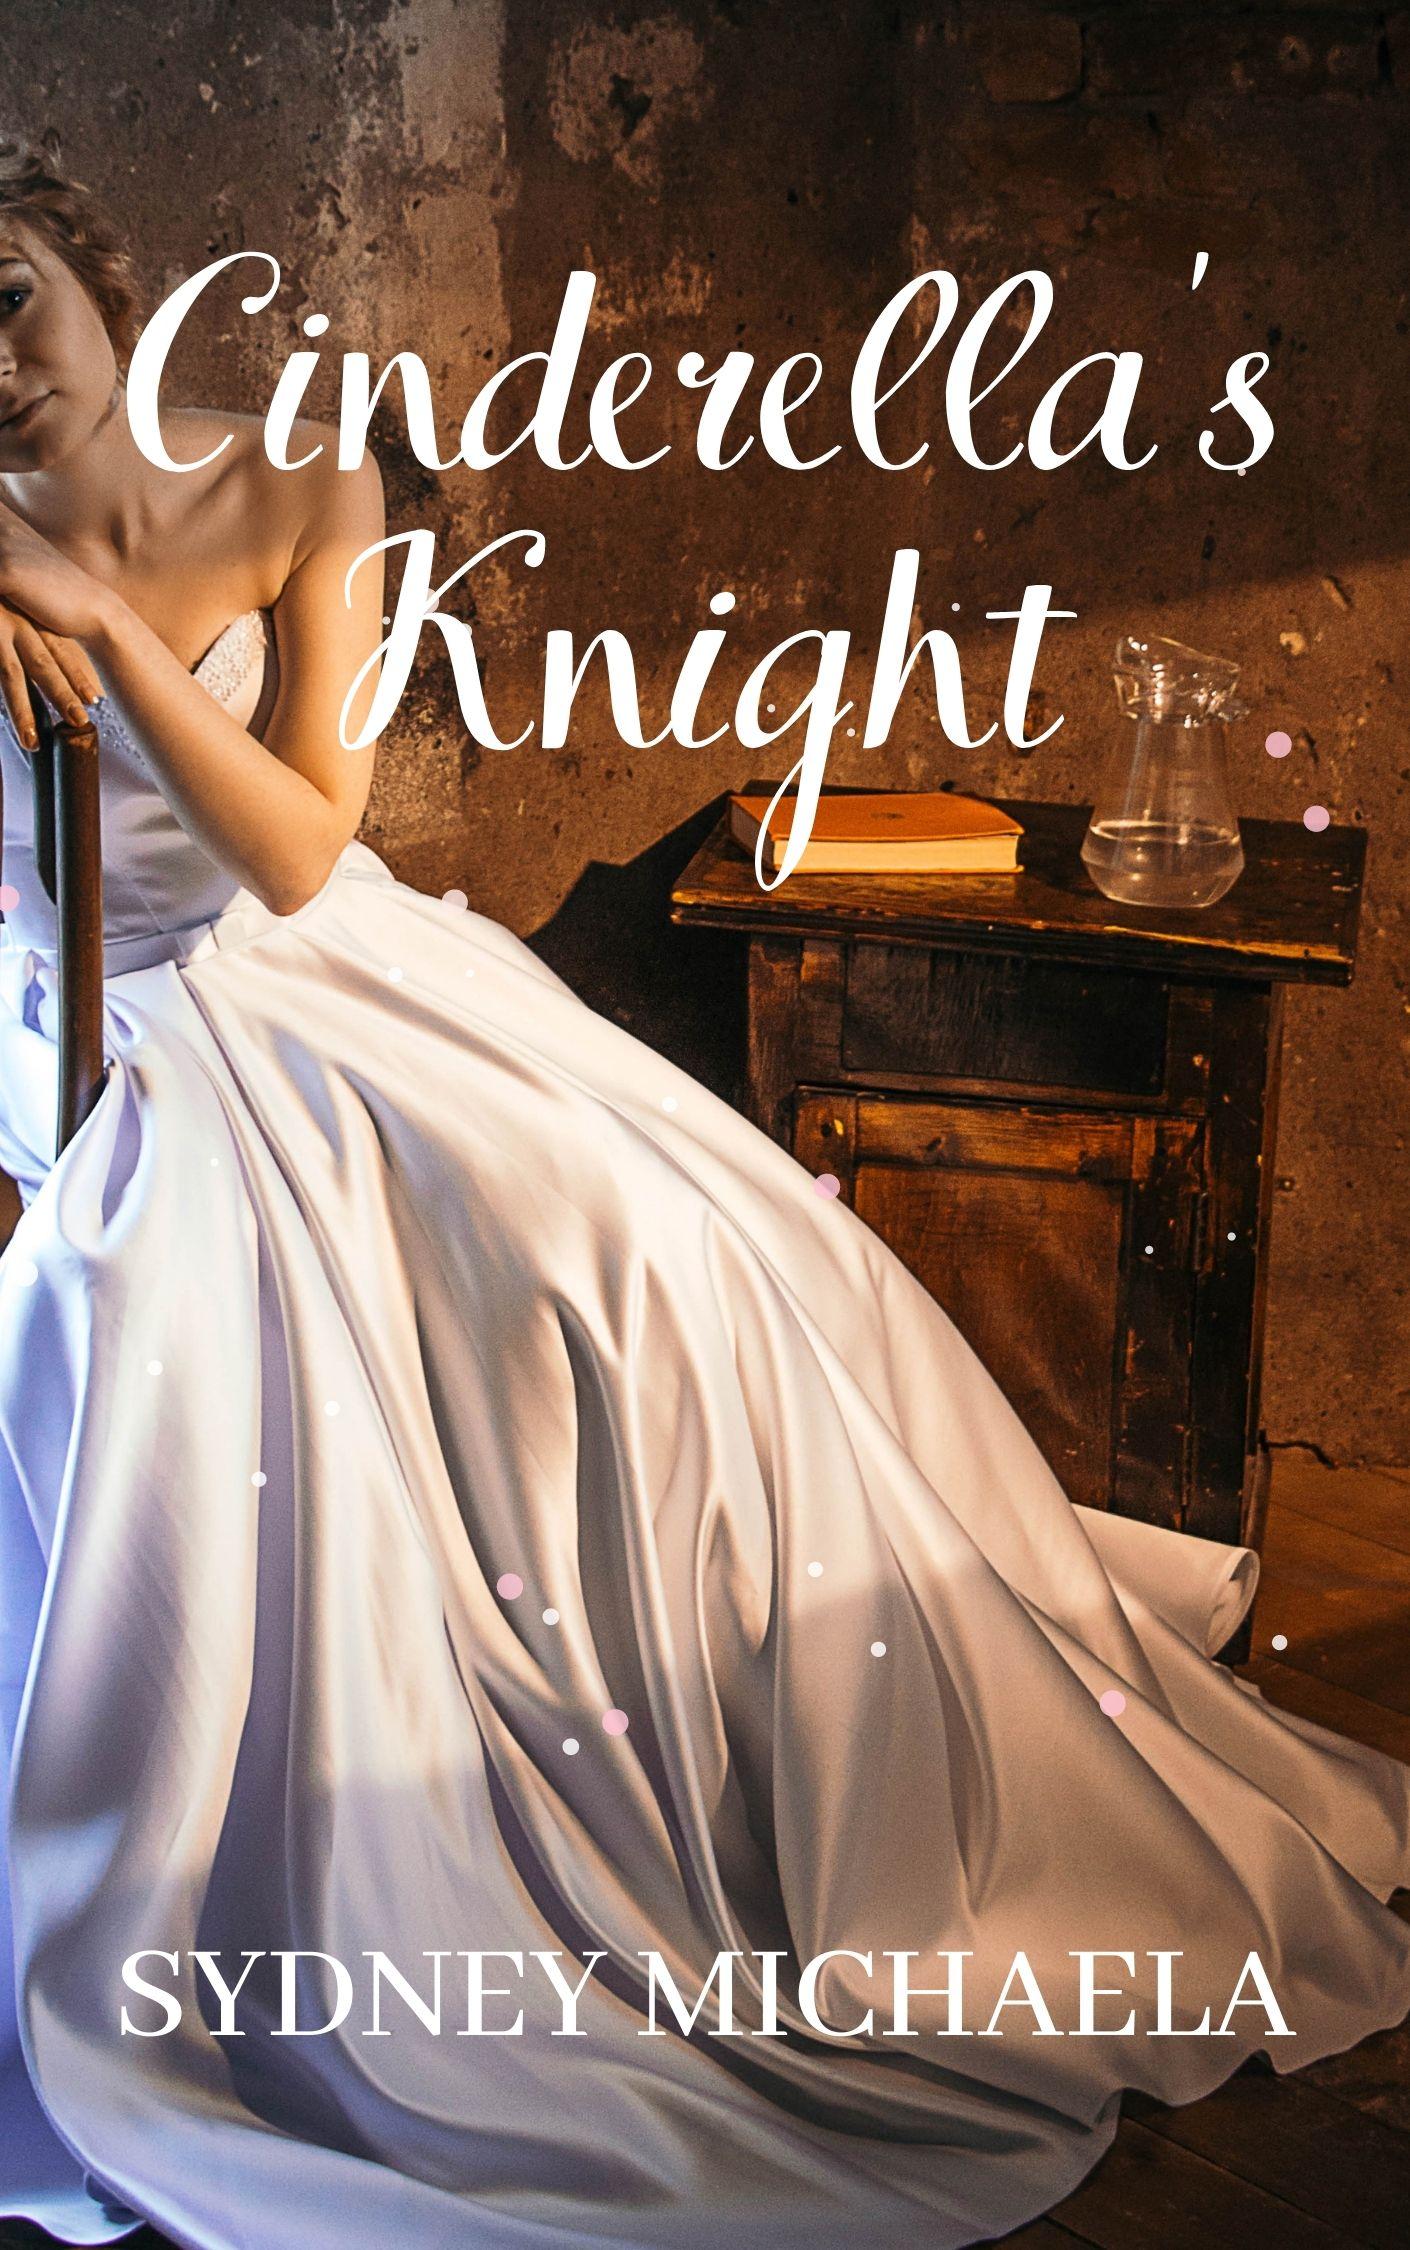 Cinderella's Knight | Sydney Michaela | Paperback